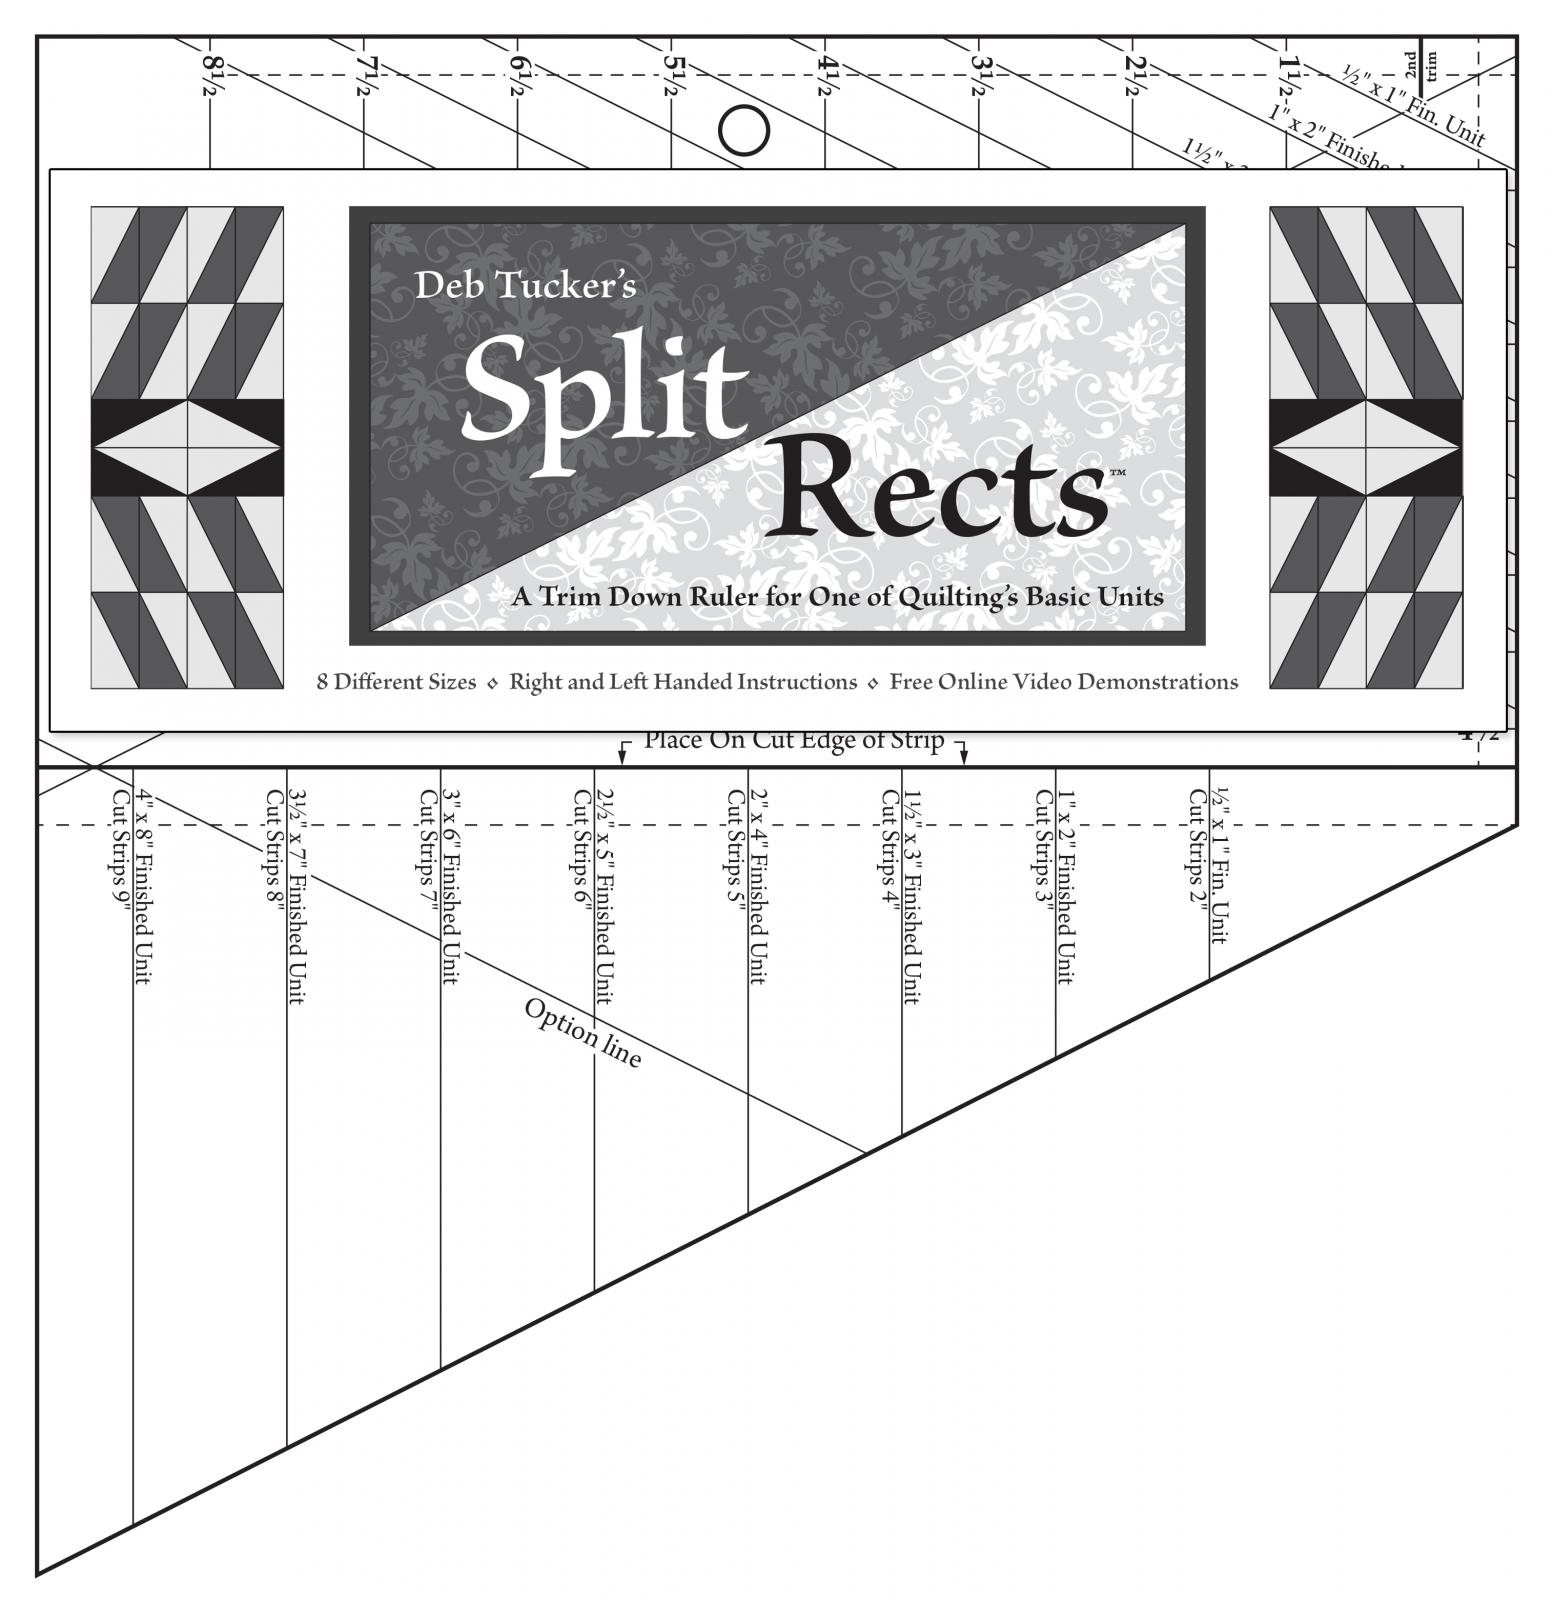 Split Rects #UDT13